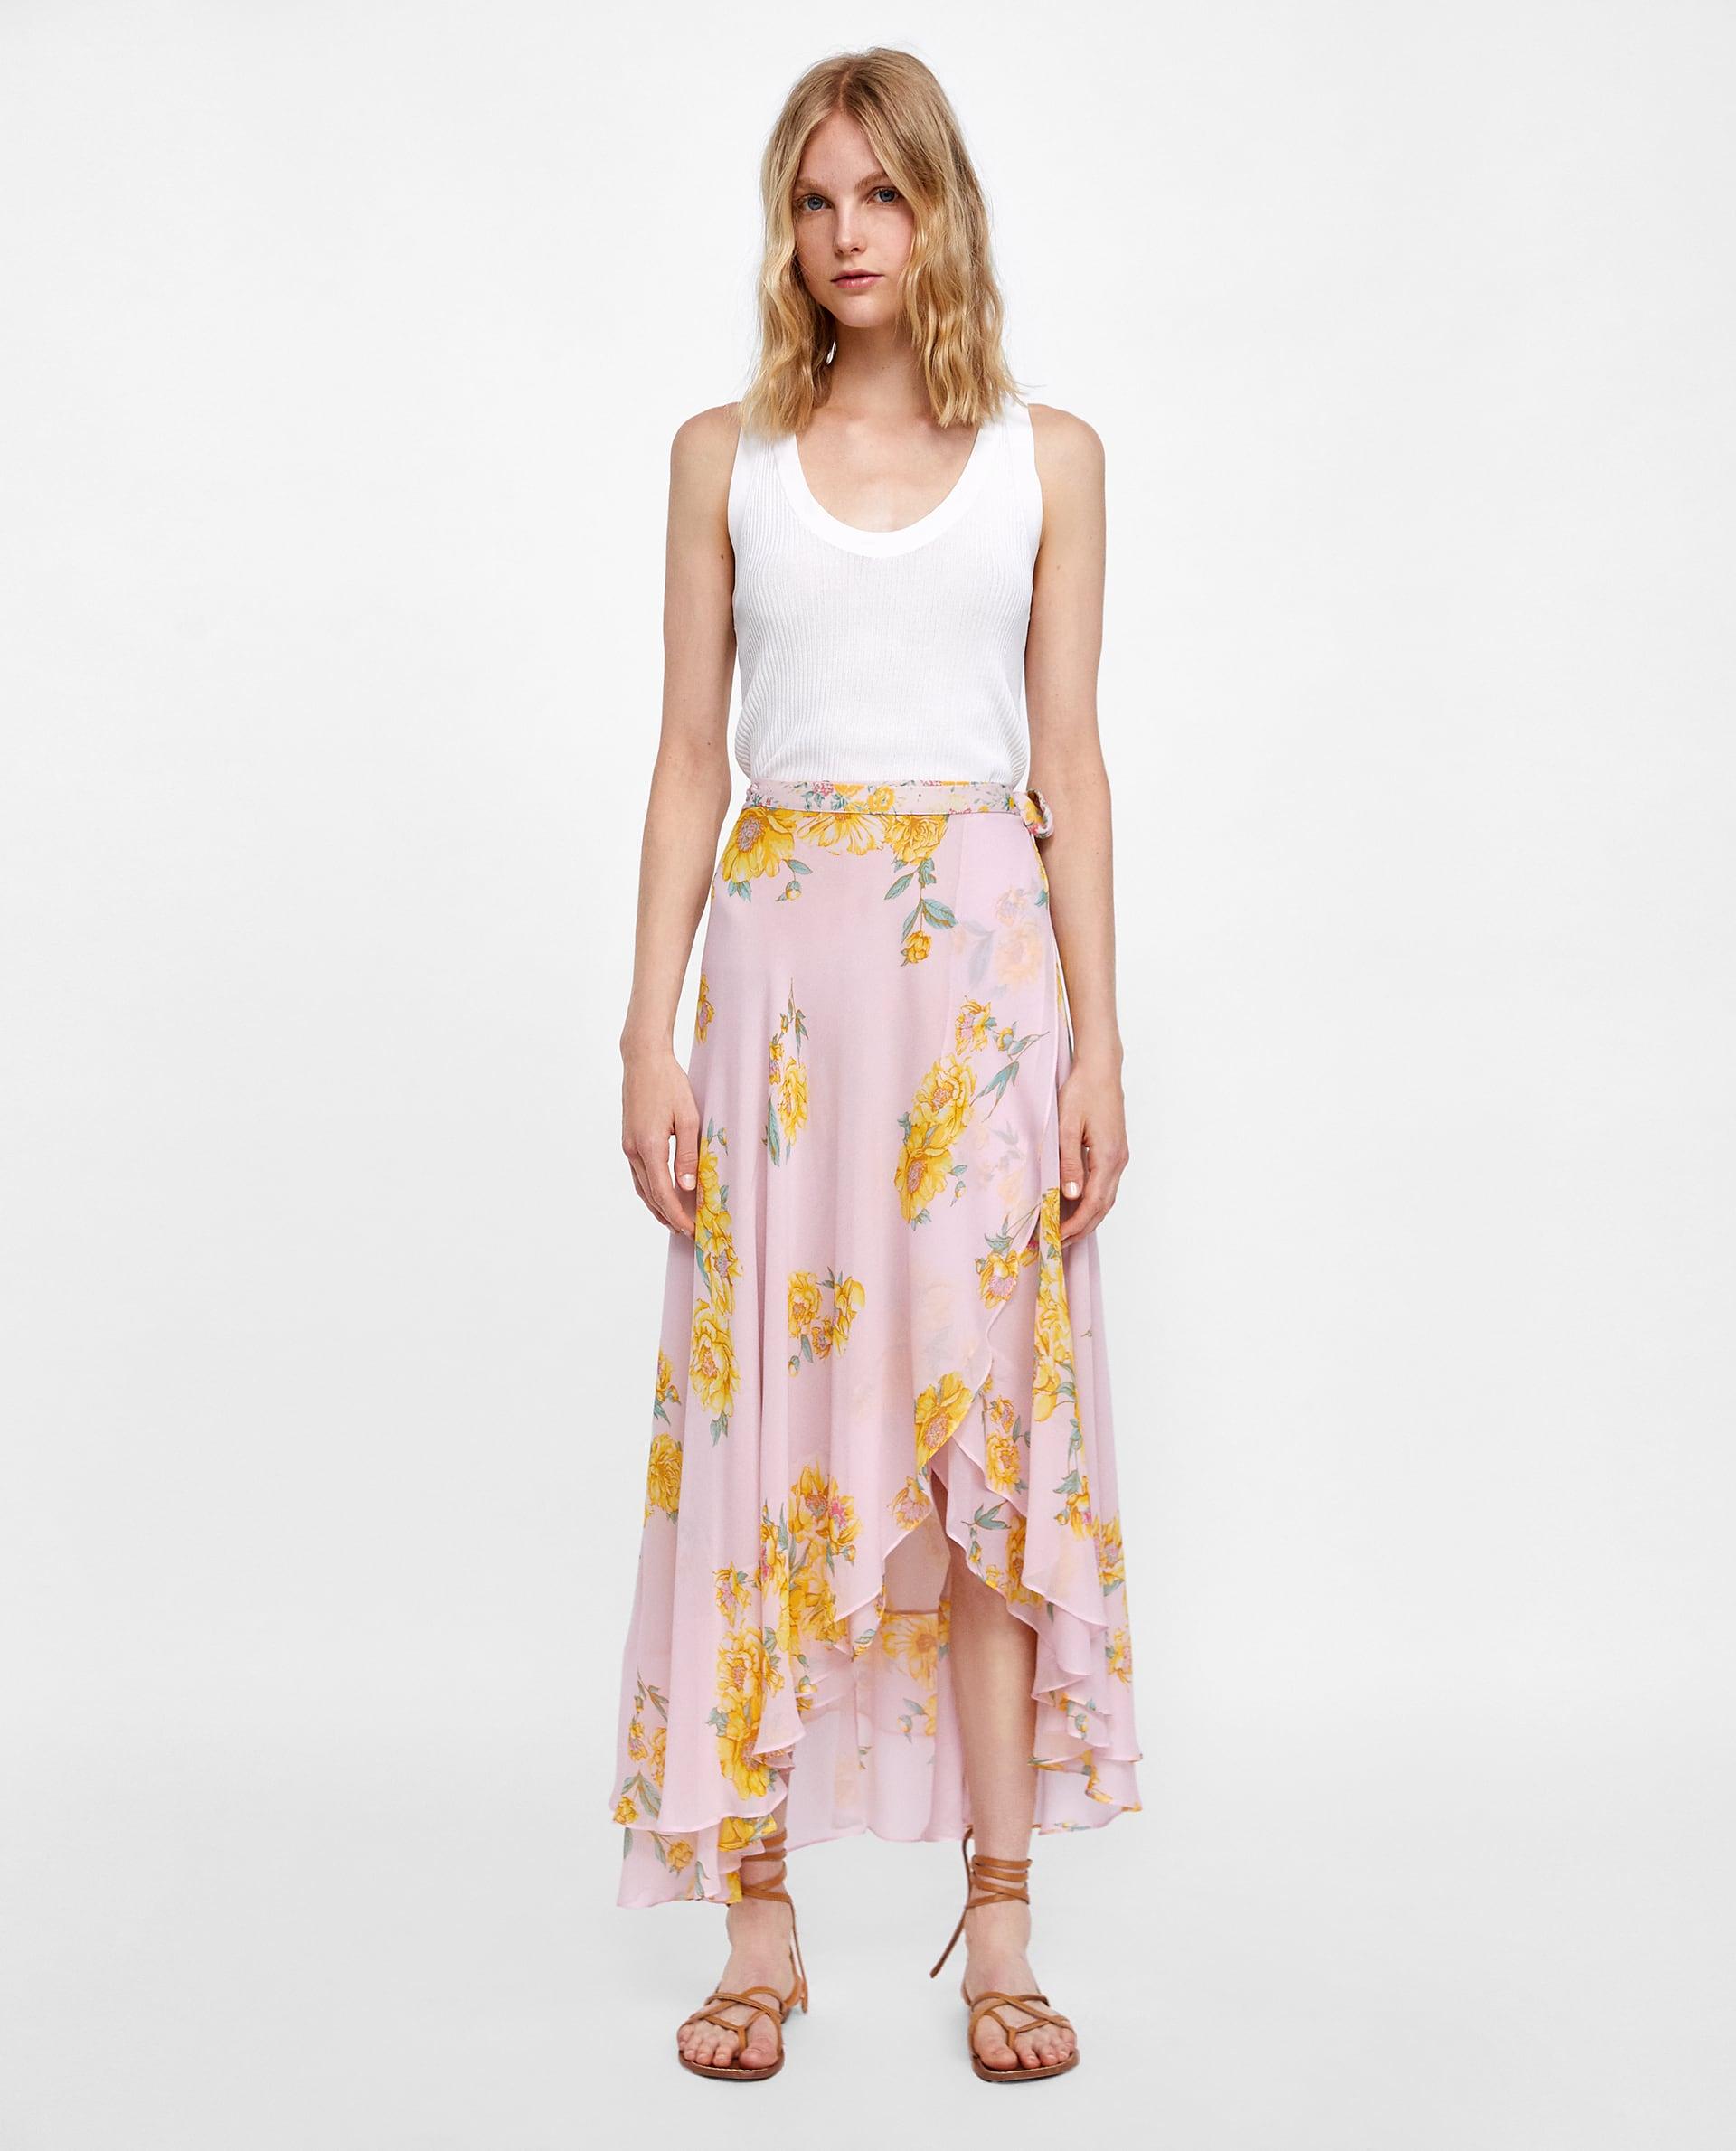 Gonna a fiori Zara lunga, asimmetrica e plissettata